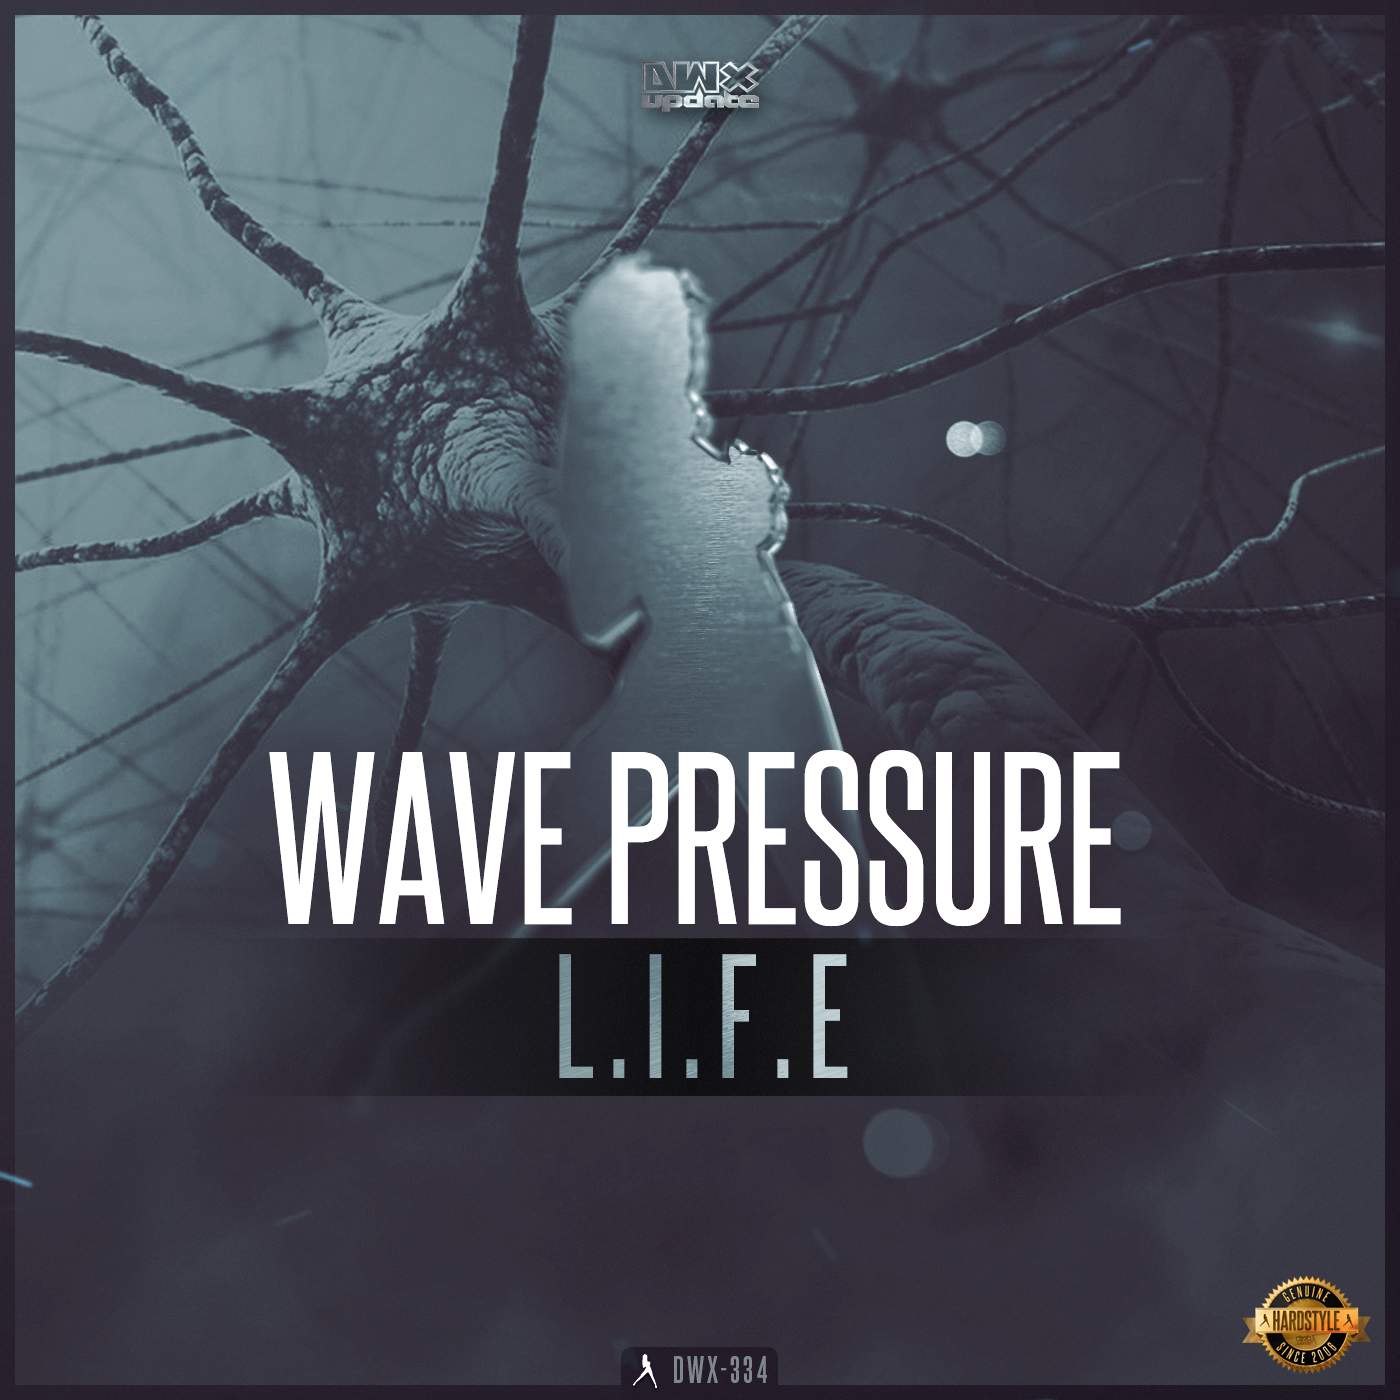 Wave Pressure - L.I.F.E. [DIRTY WORKZ] DWX334